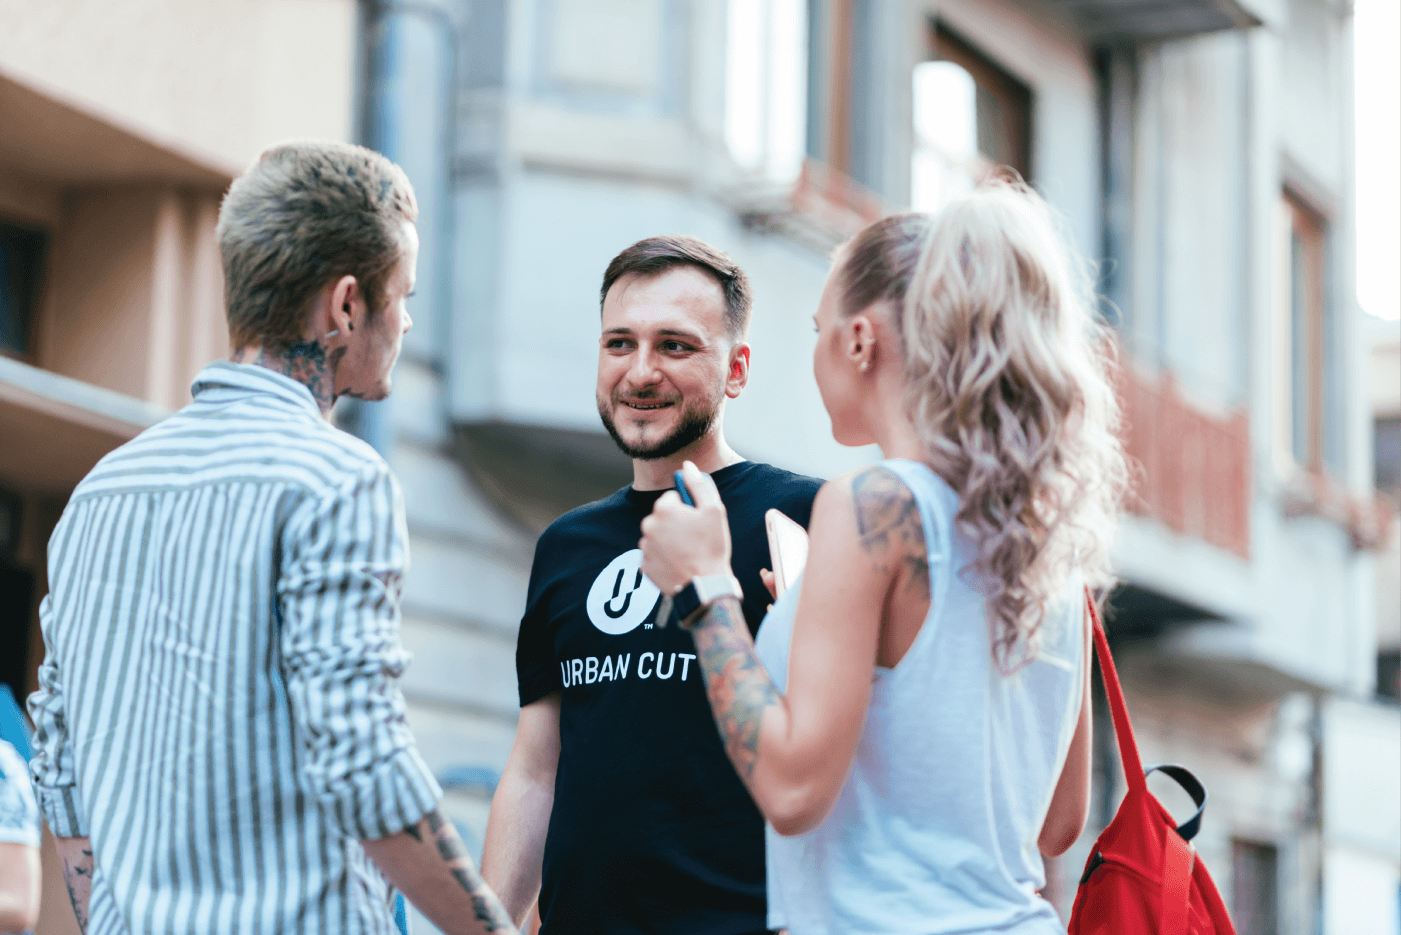 familia Urban Cut Romania - Fosti membri ai echipei acum prieteni